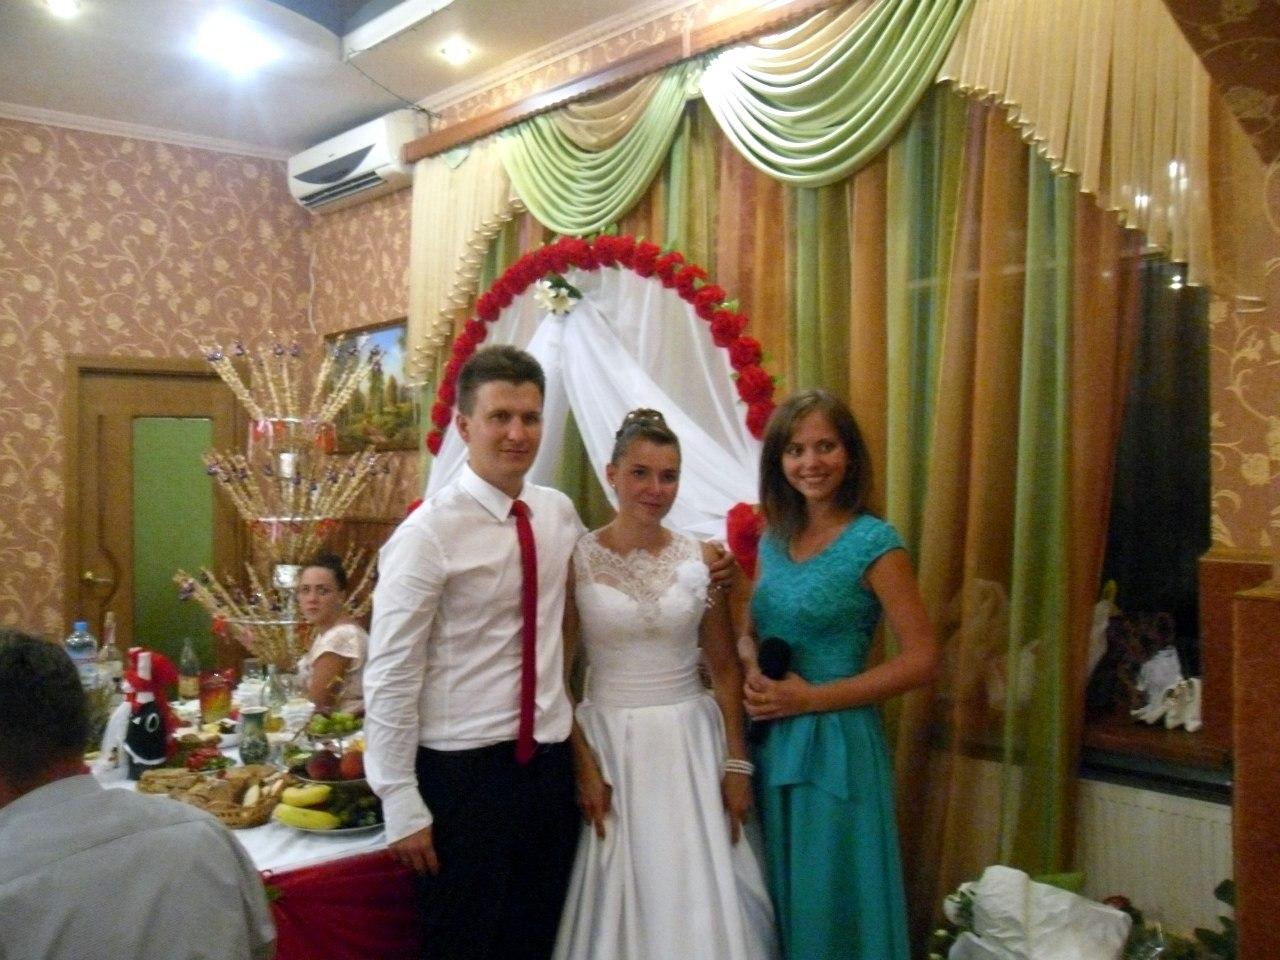 031 праздник, свадьба, свадьба летом, свадьба зимой, свадьба